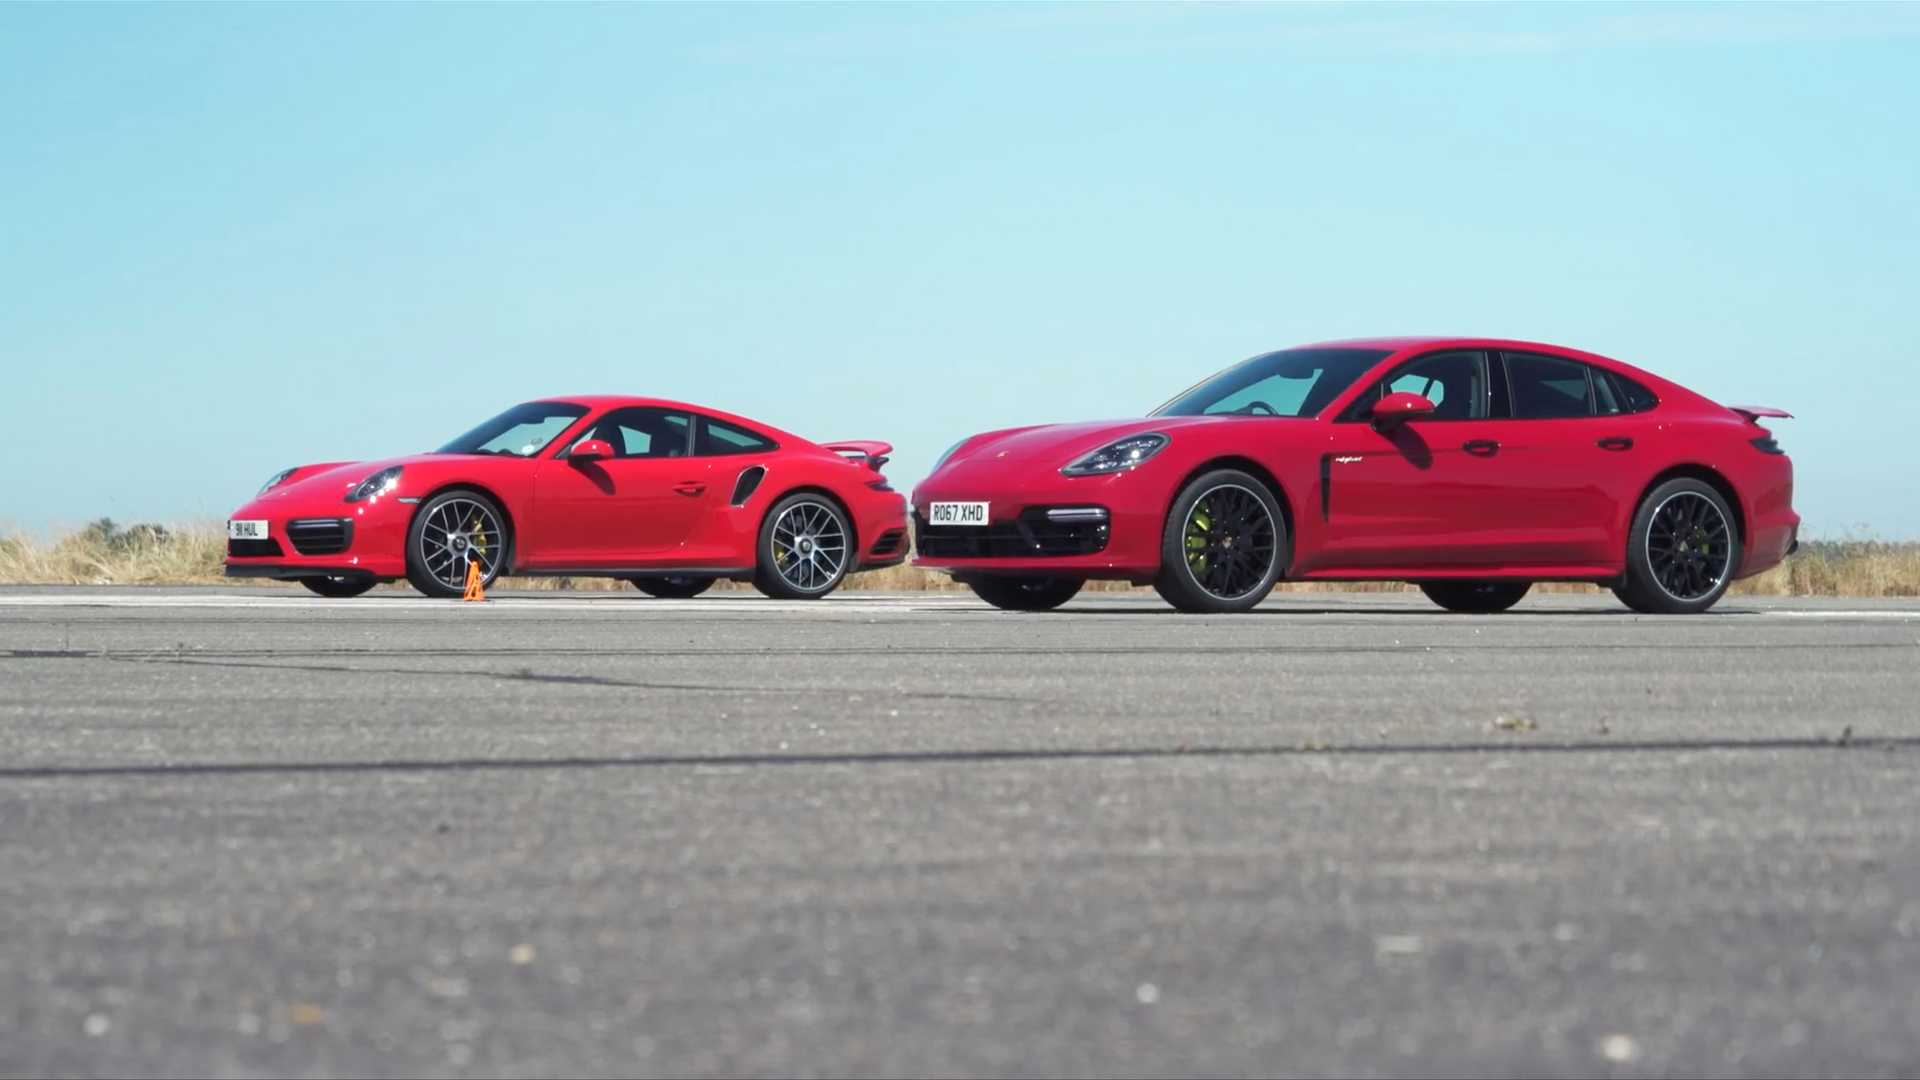 Porsche Panamera Turbo S E Hybrid Drag Races The 911 Turbo S